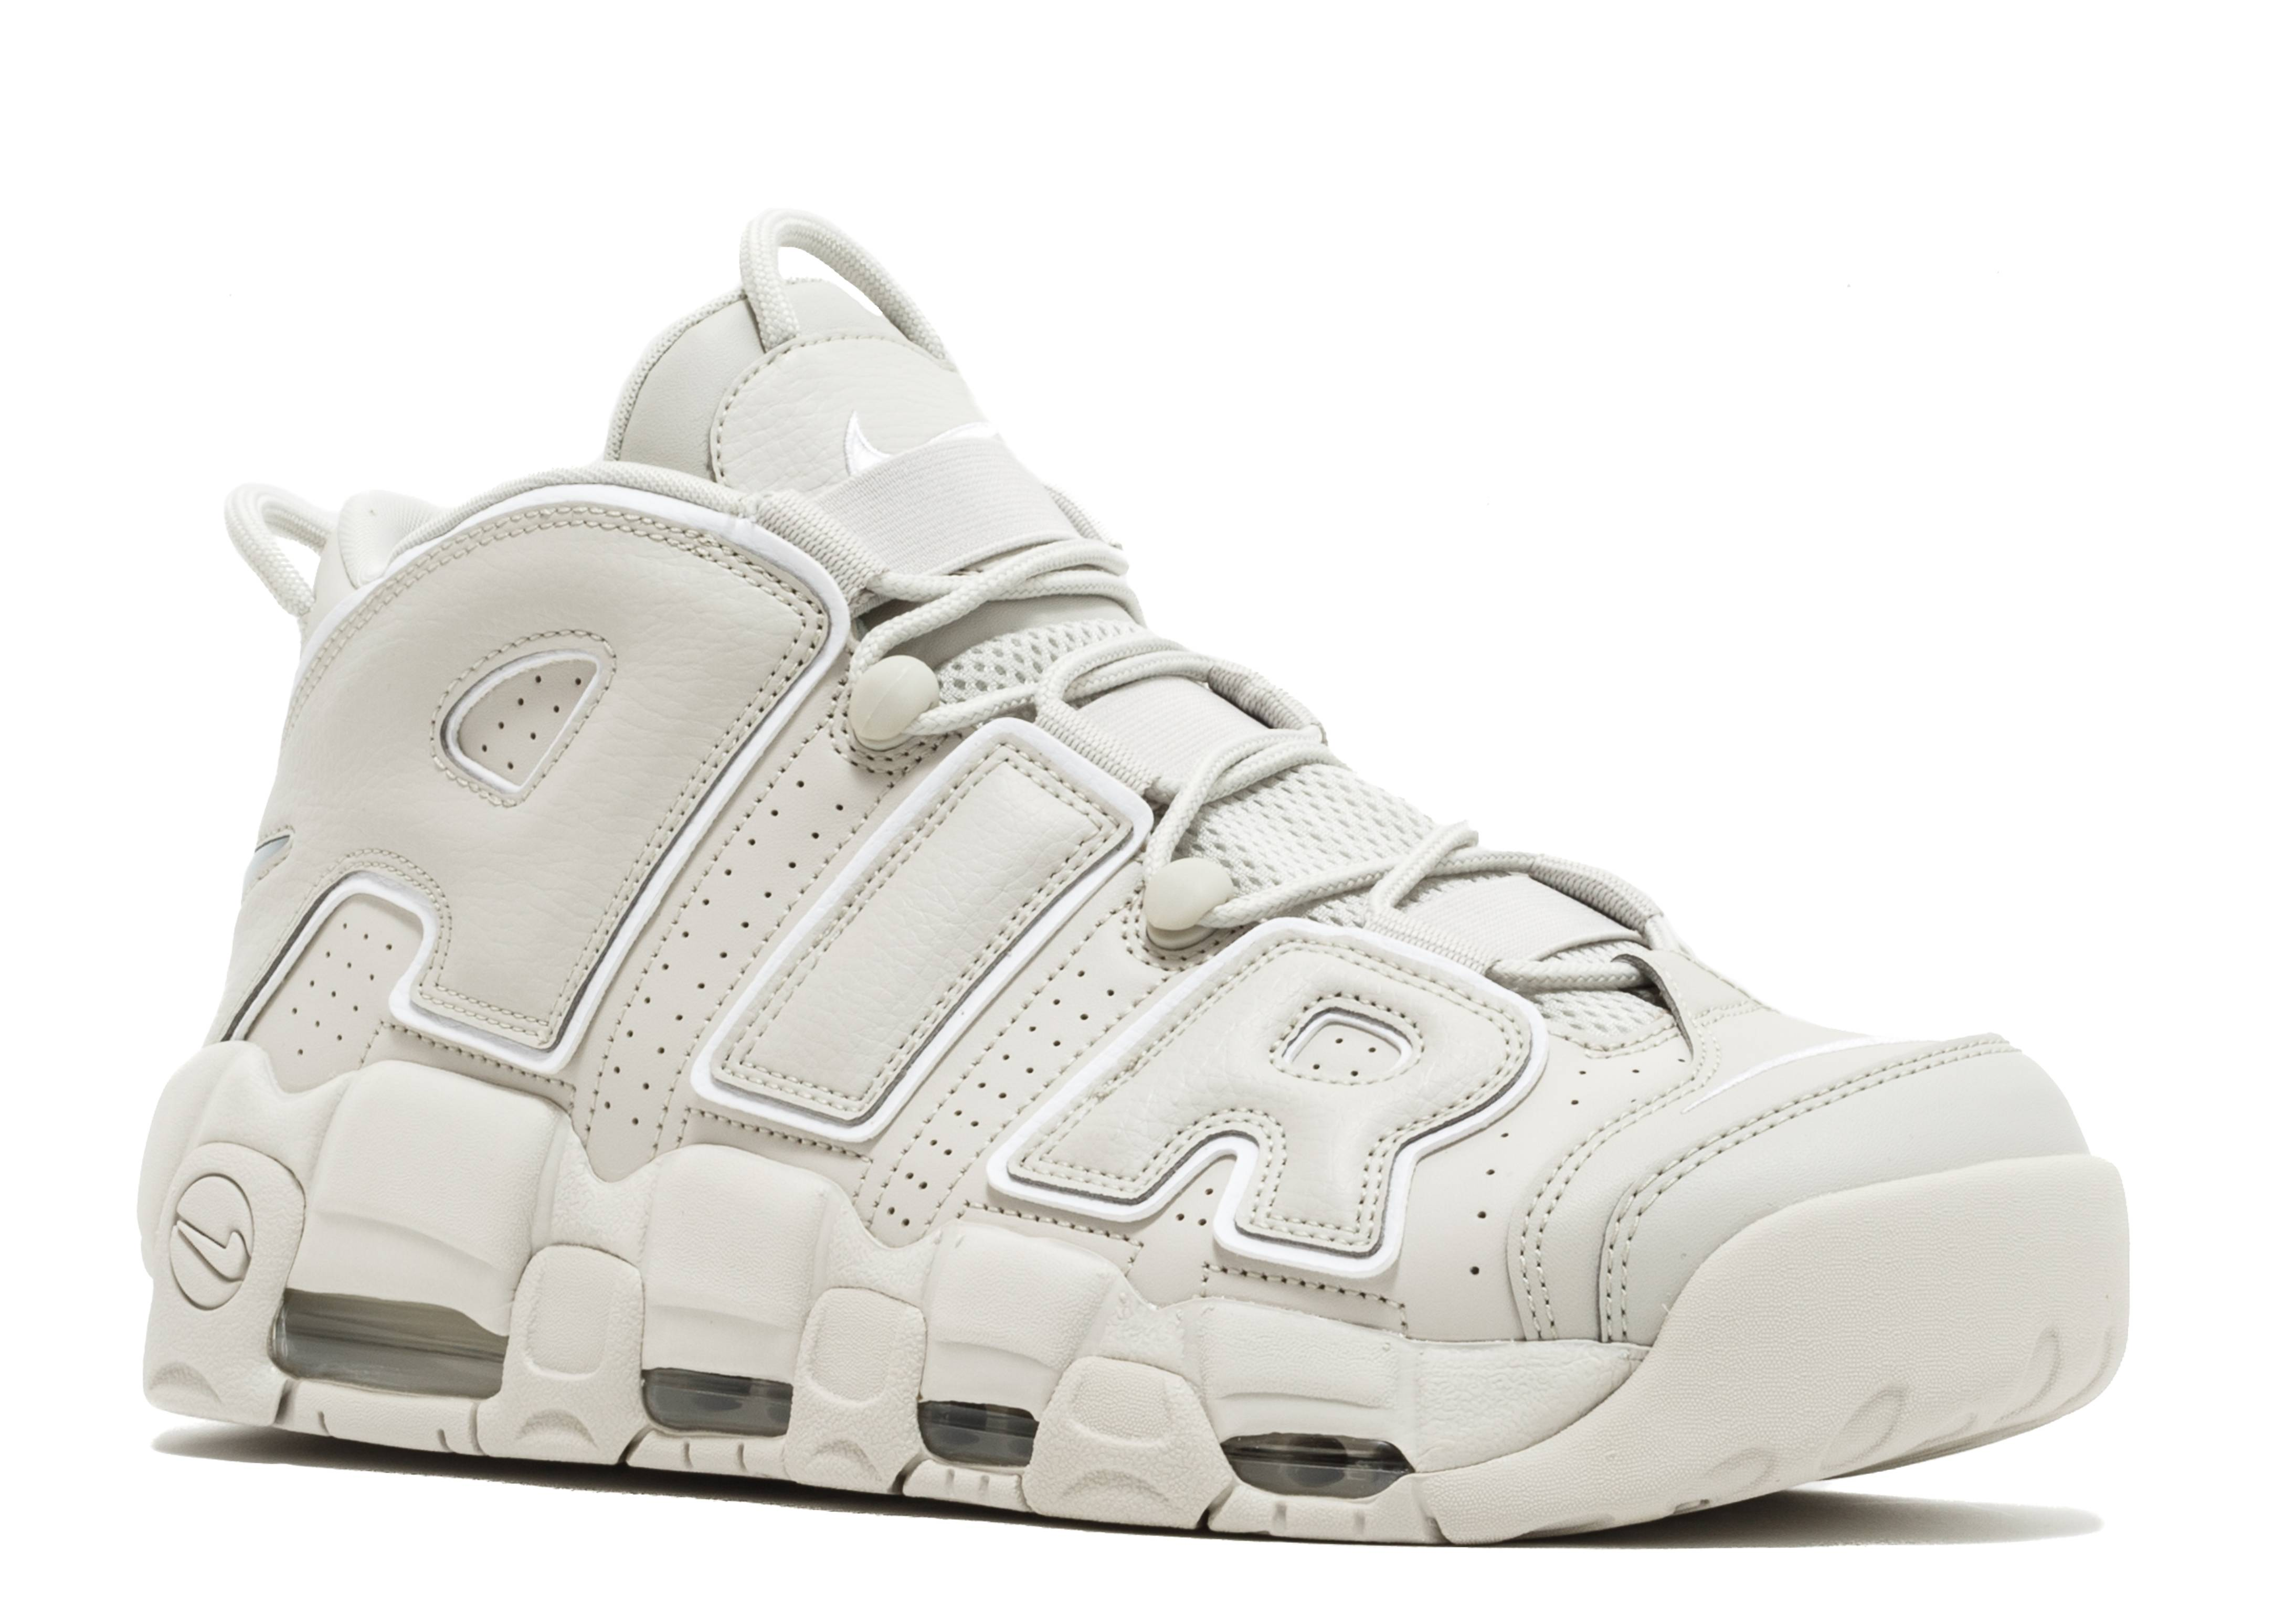 3be997ce01 Air More Uptempo 96 - Nike - 921948 001 - light bone/white-light bone |  Flight Club